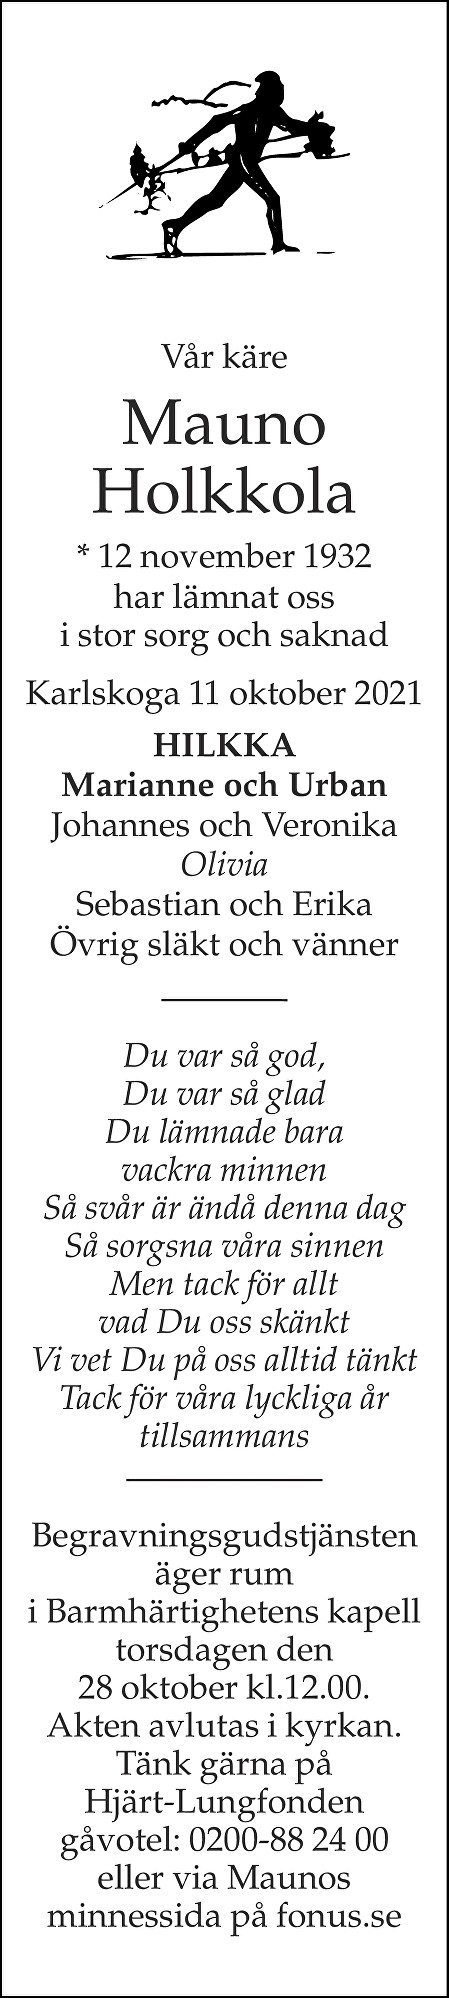 Mauno Holkkola Death notice